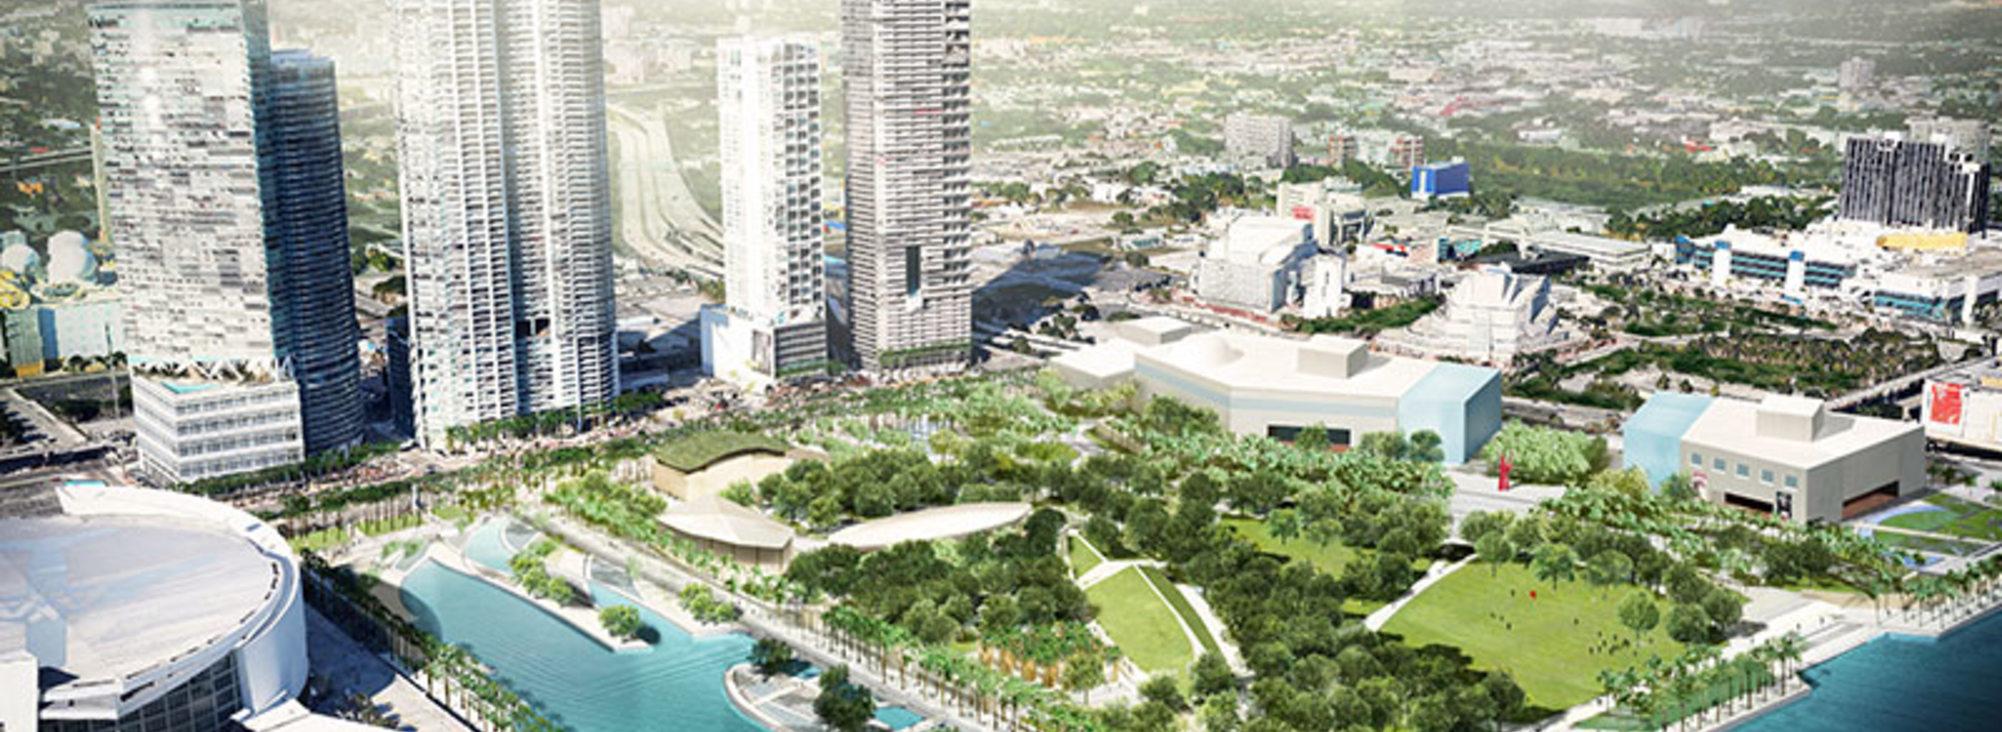 Rending of Museum Park Miami, credit Civitas, Inc.